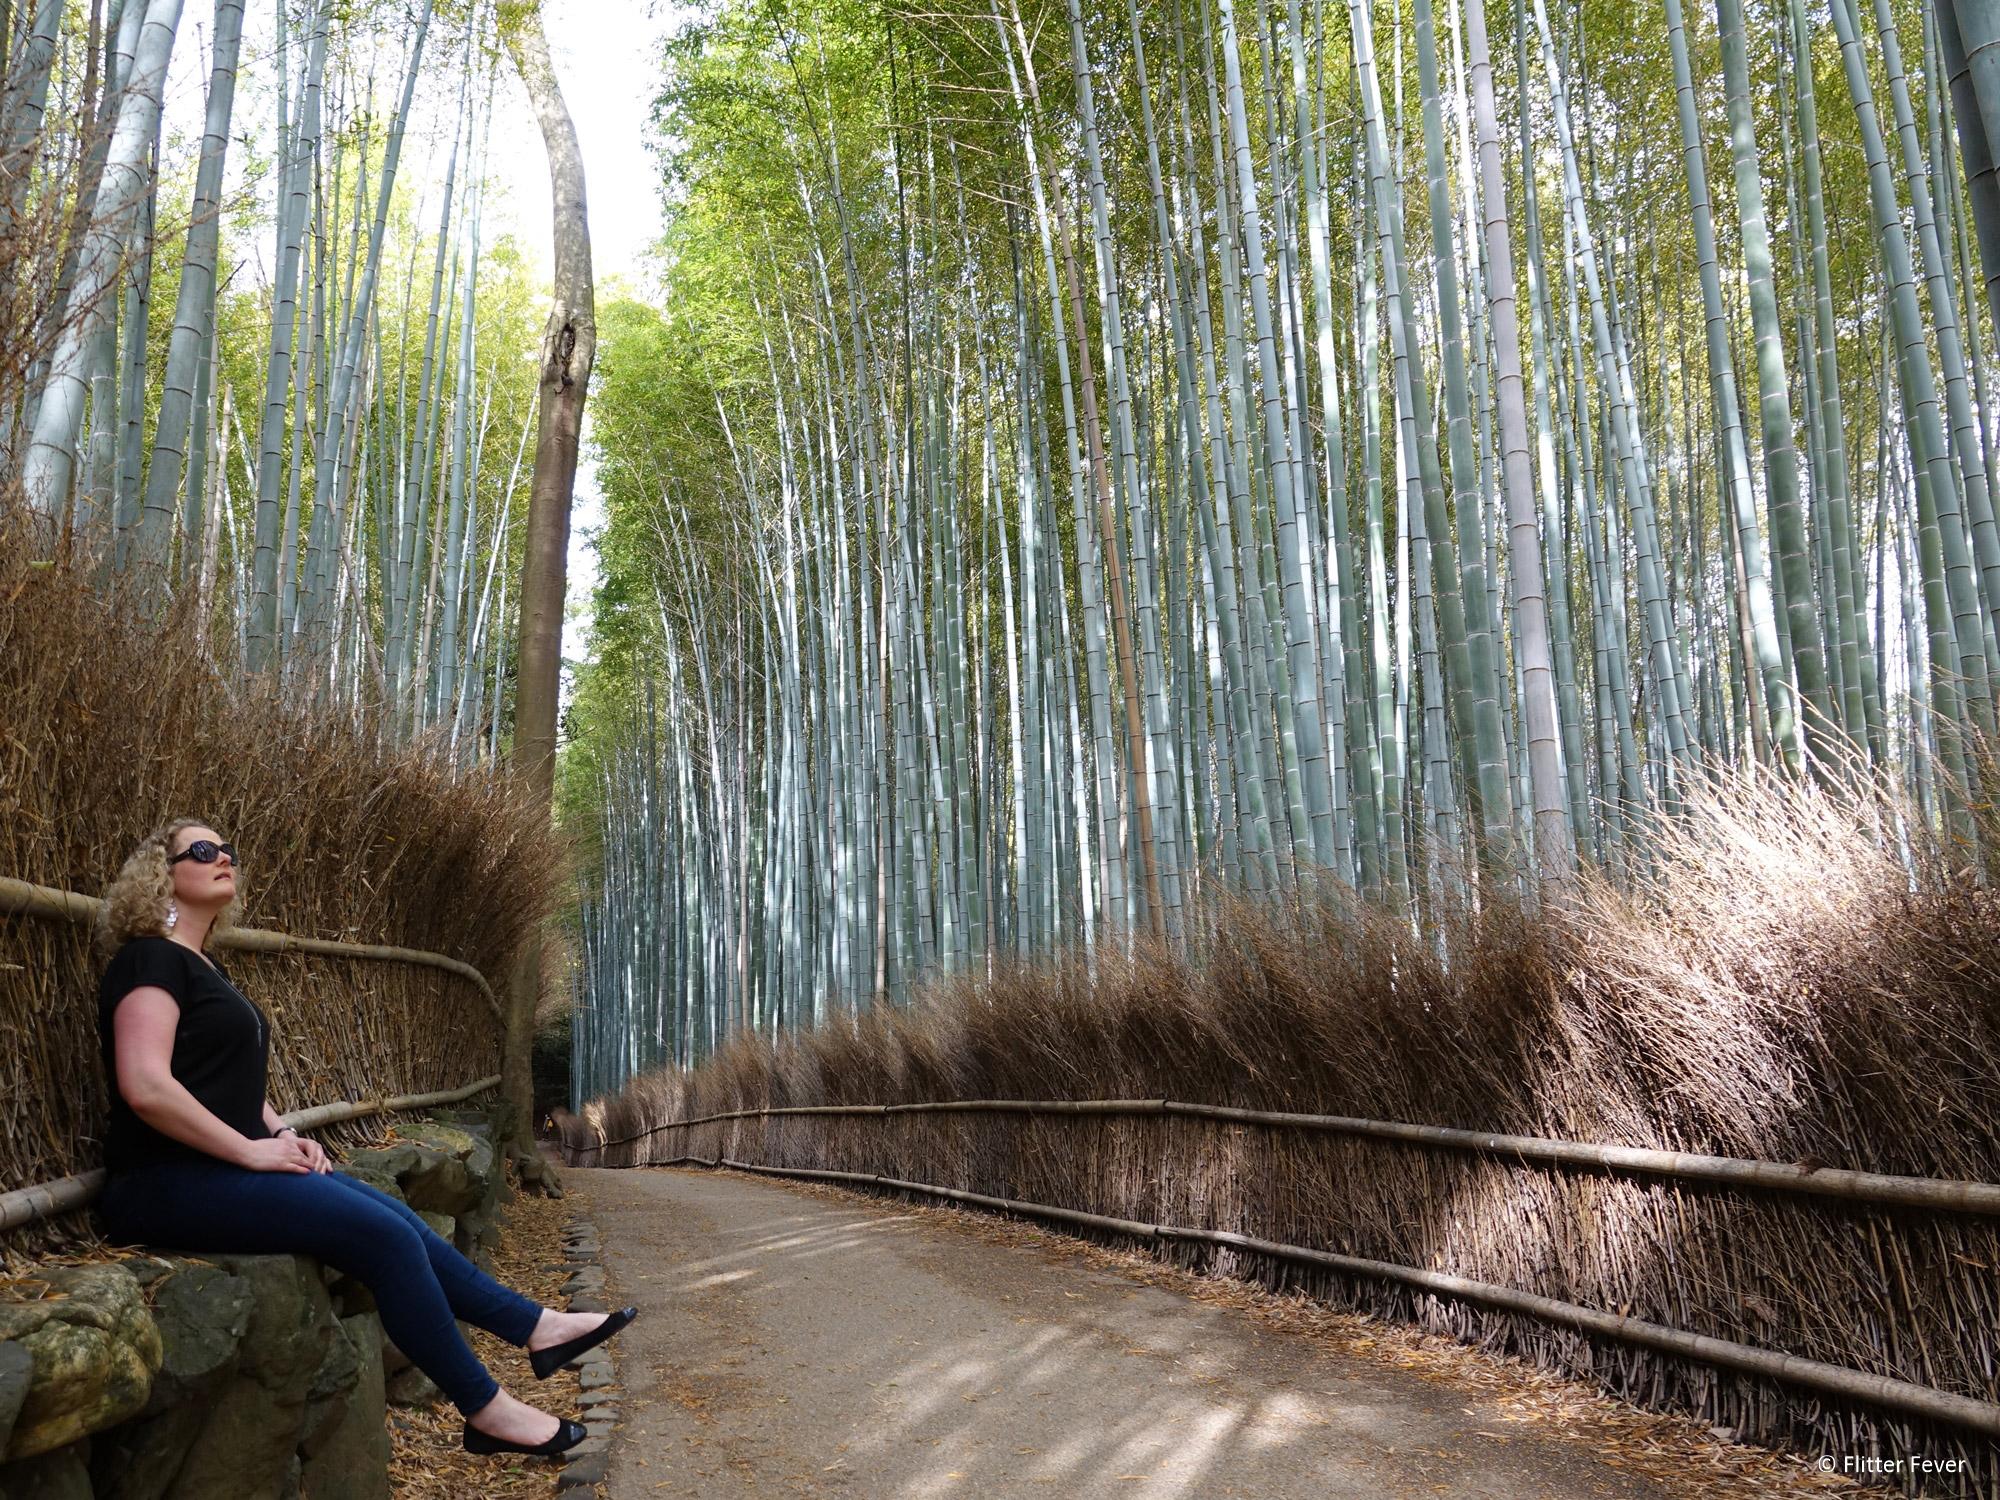 Flitter Fever - Arashiyama Bamboo Grove Kyoto